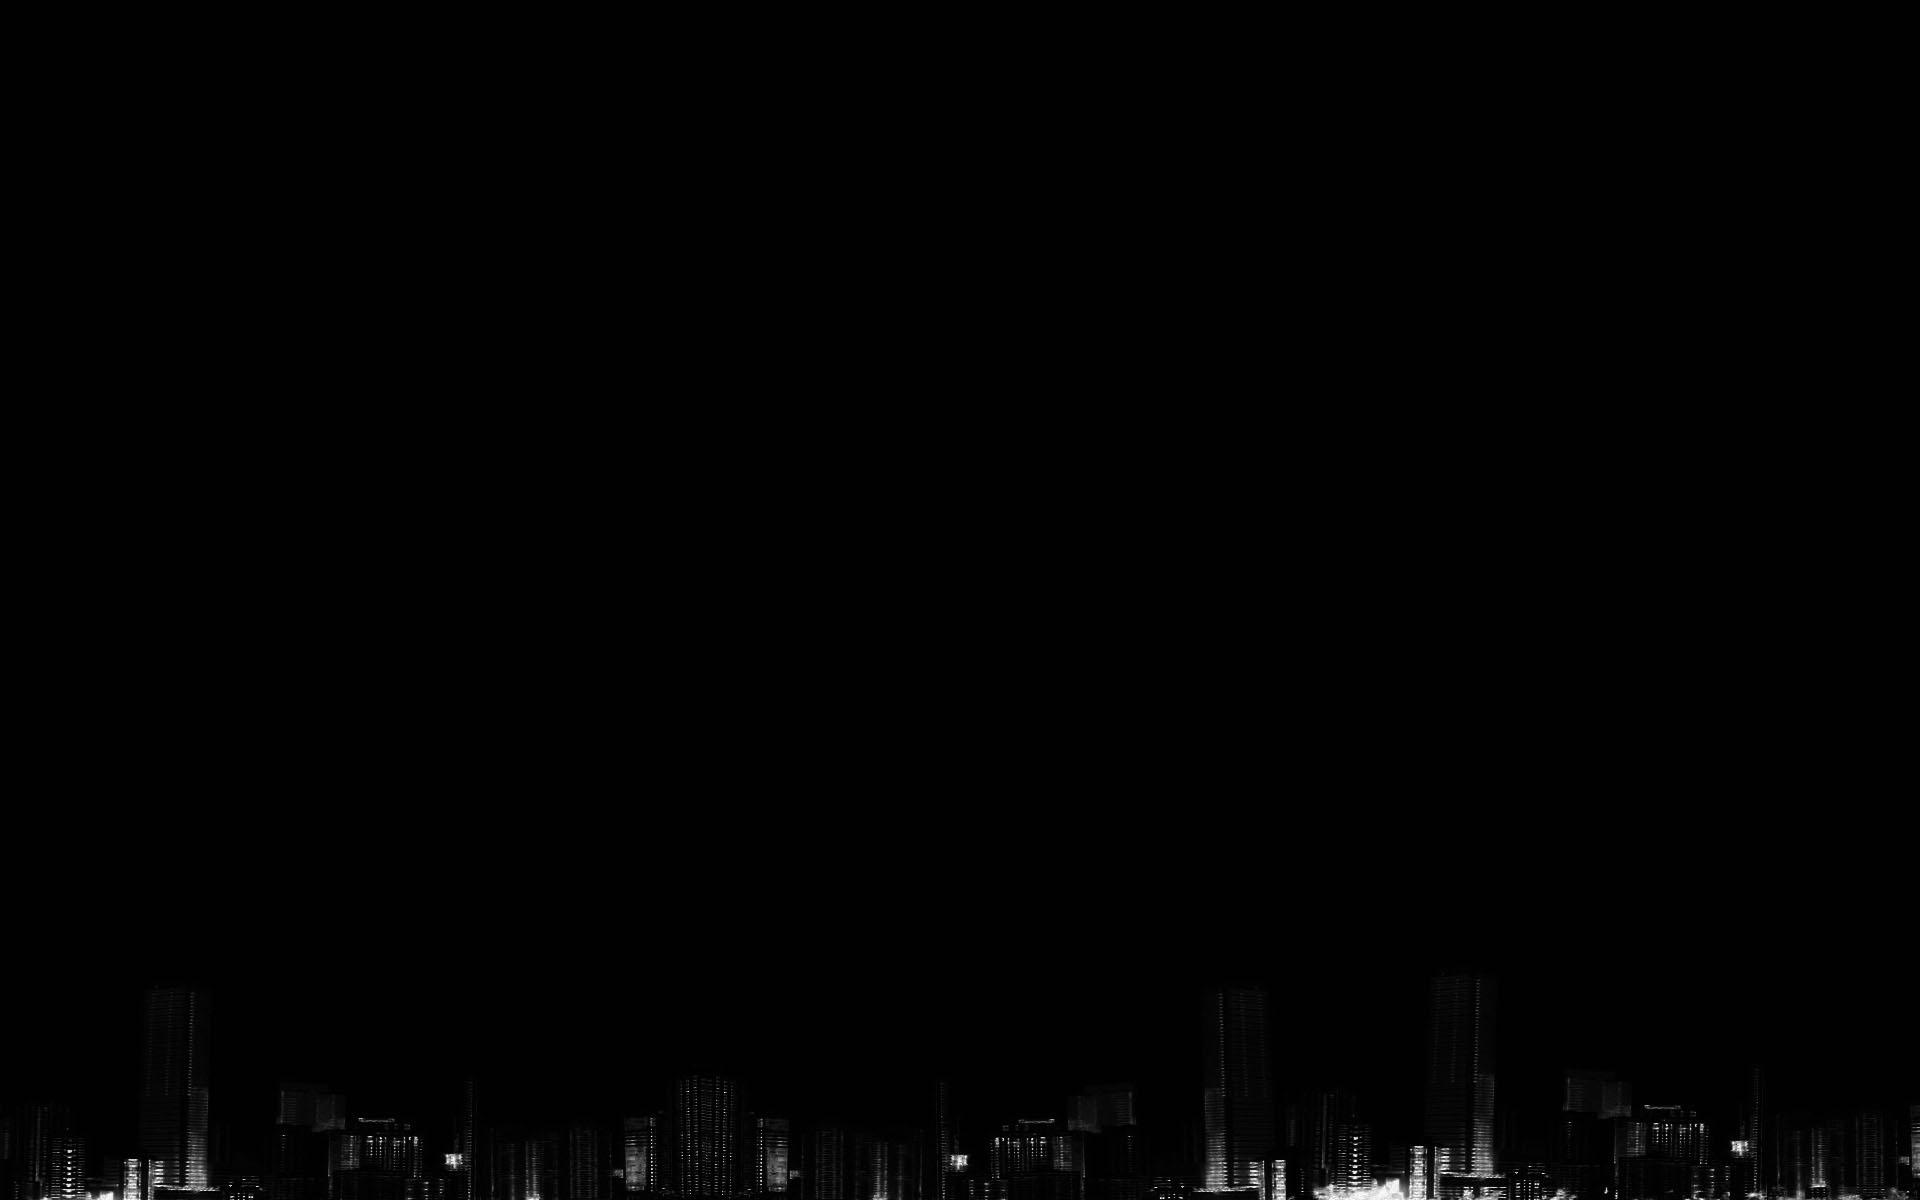 Black Desktop Wallpaper 17 Cool Hd Wallpaper Hdblackwallpapercom